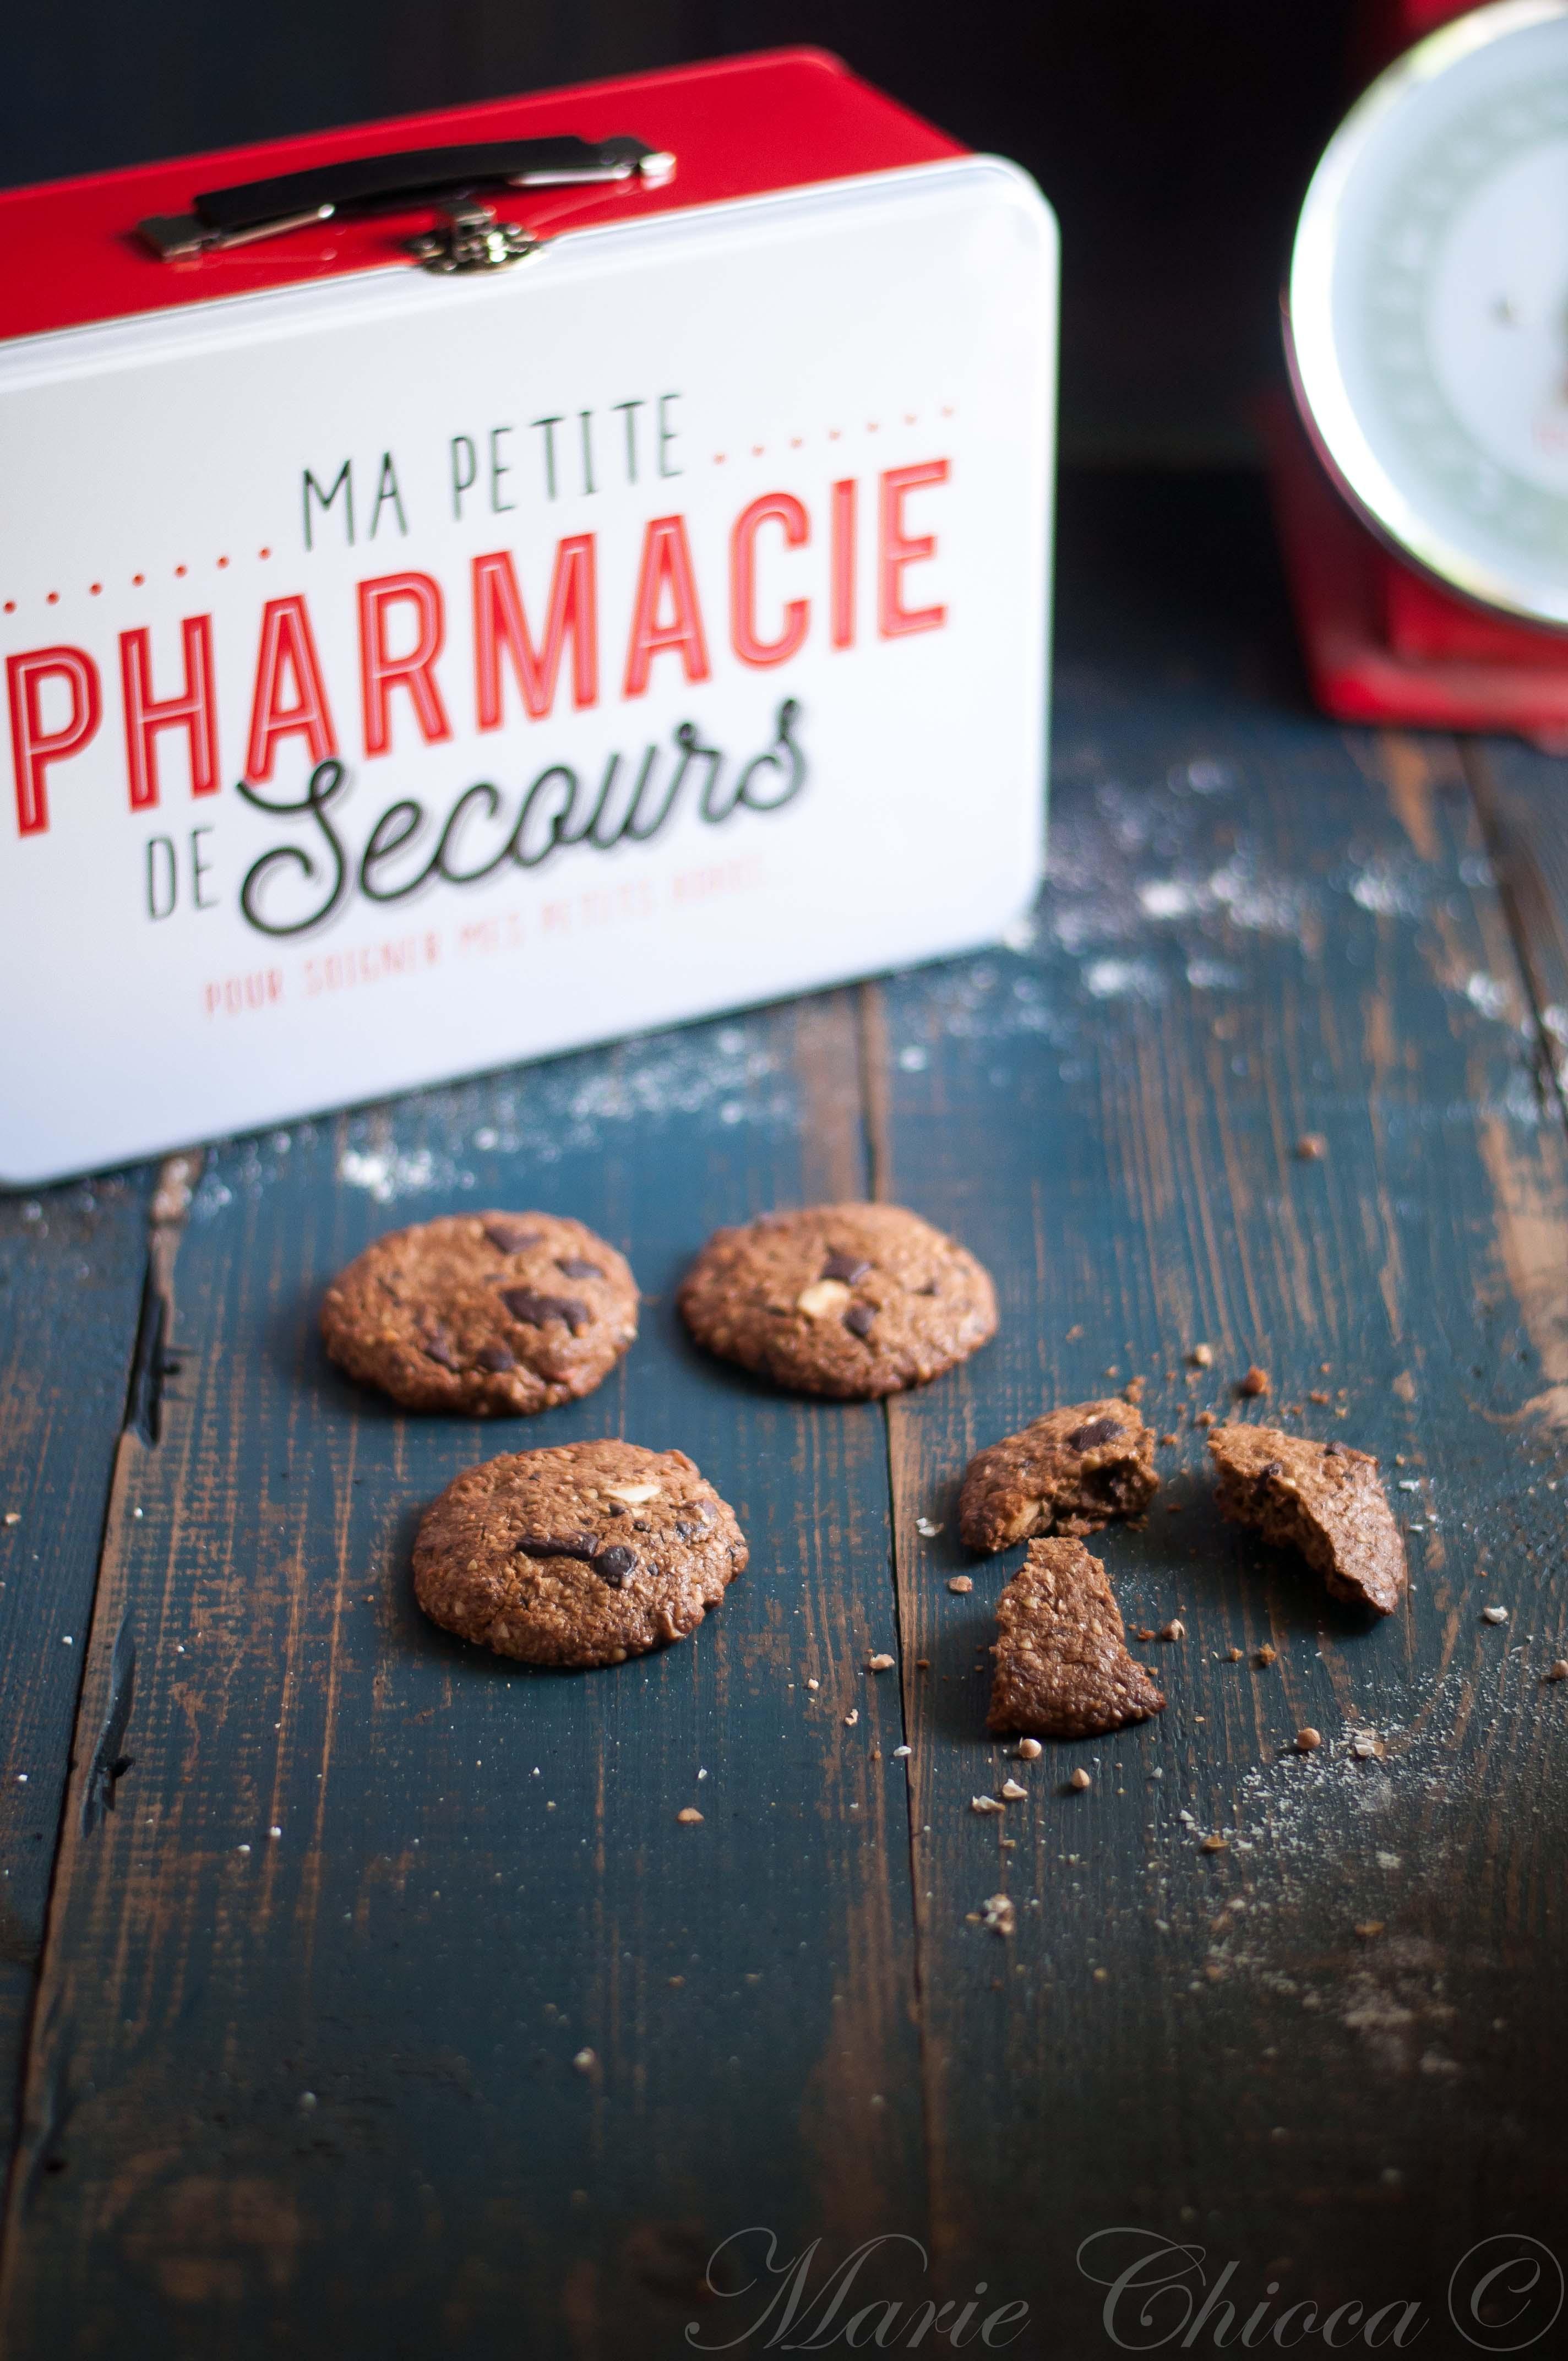 Cookies à IG très bas2